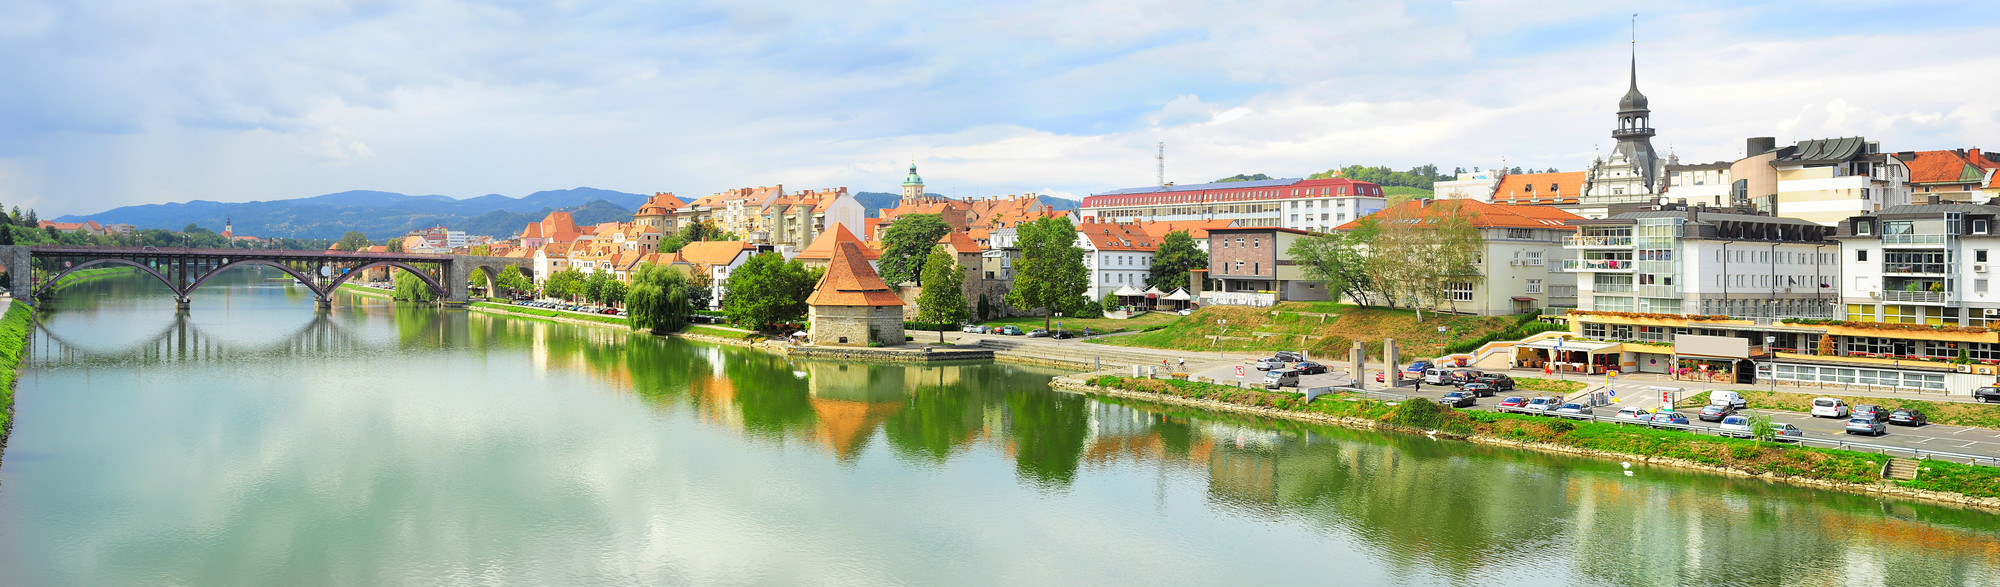 slovenia, maribor, città, vista, cultura, turismo